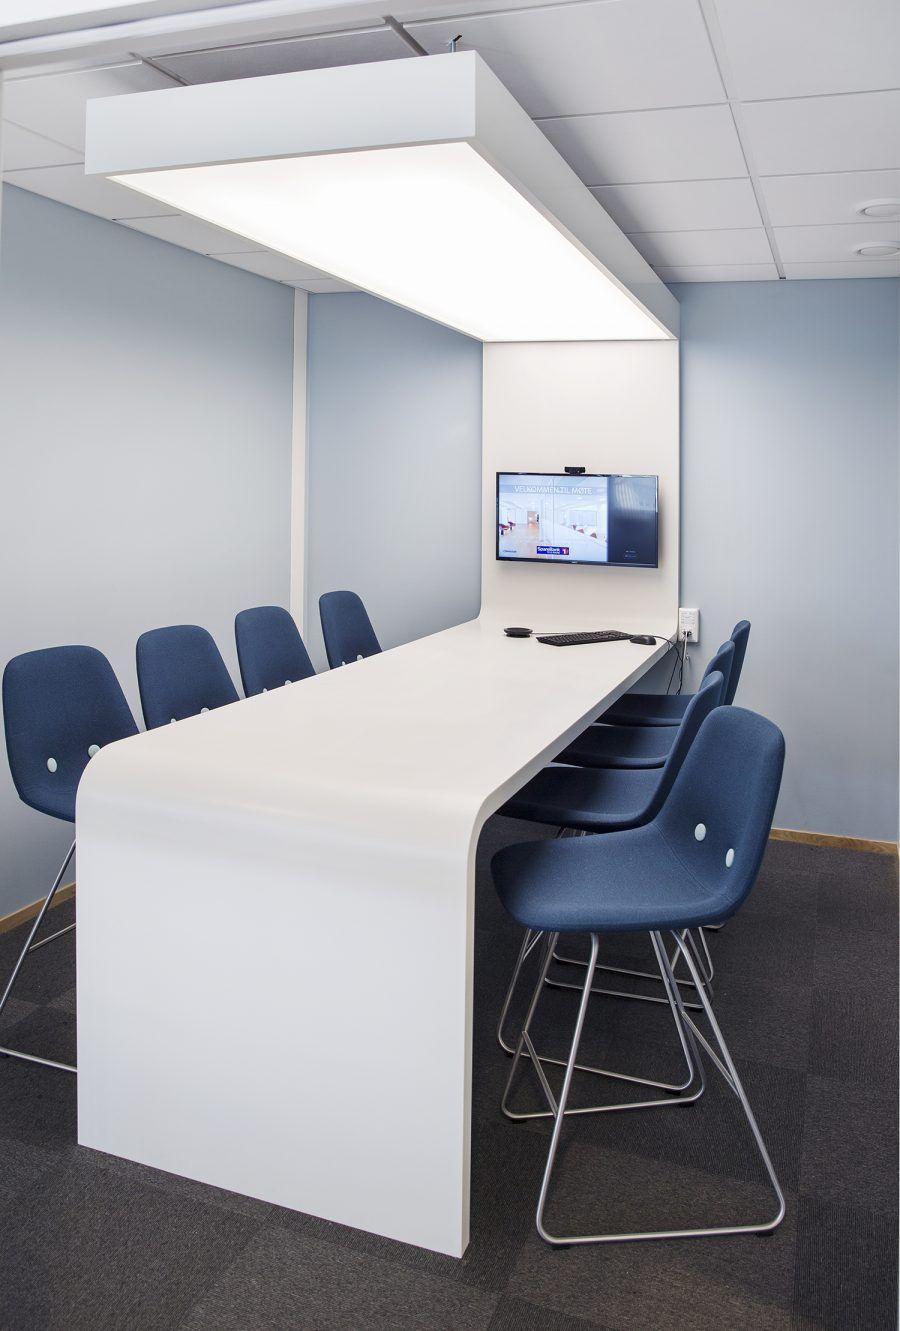 Sparebank 1 Porsgrunn Meeting Room Design By Iark Photo By Yvonne Wilhelmsen Meetingroom Conferanceroom Collabor Kontorinnredning Designer Kontordesign